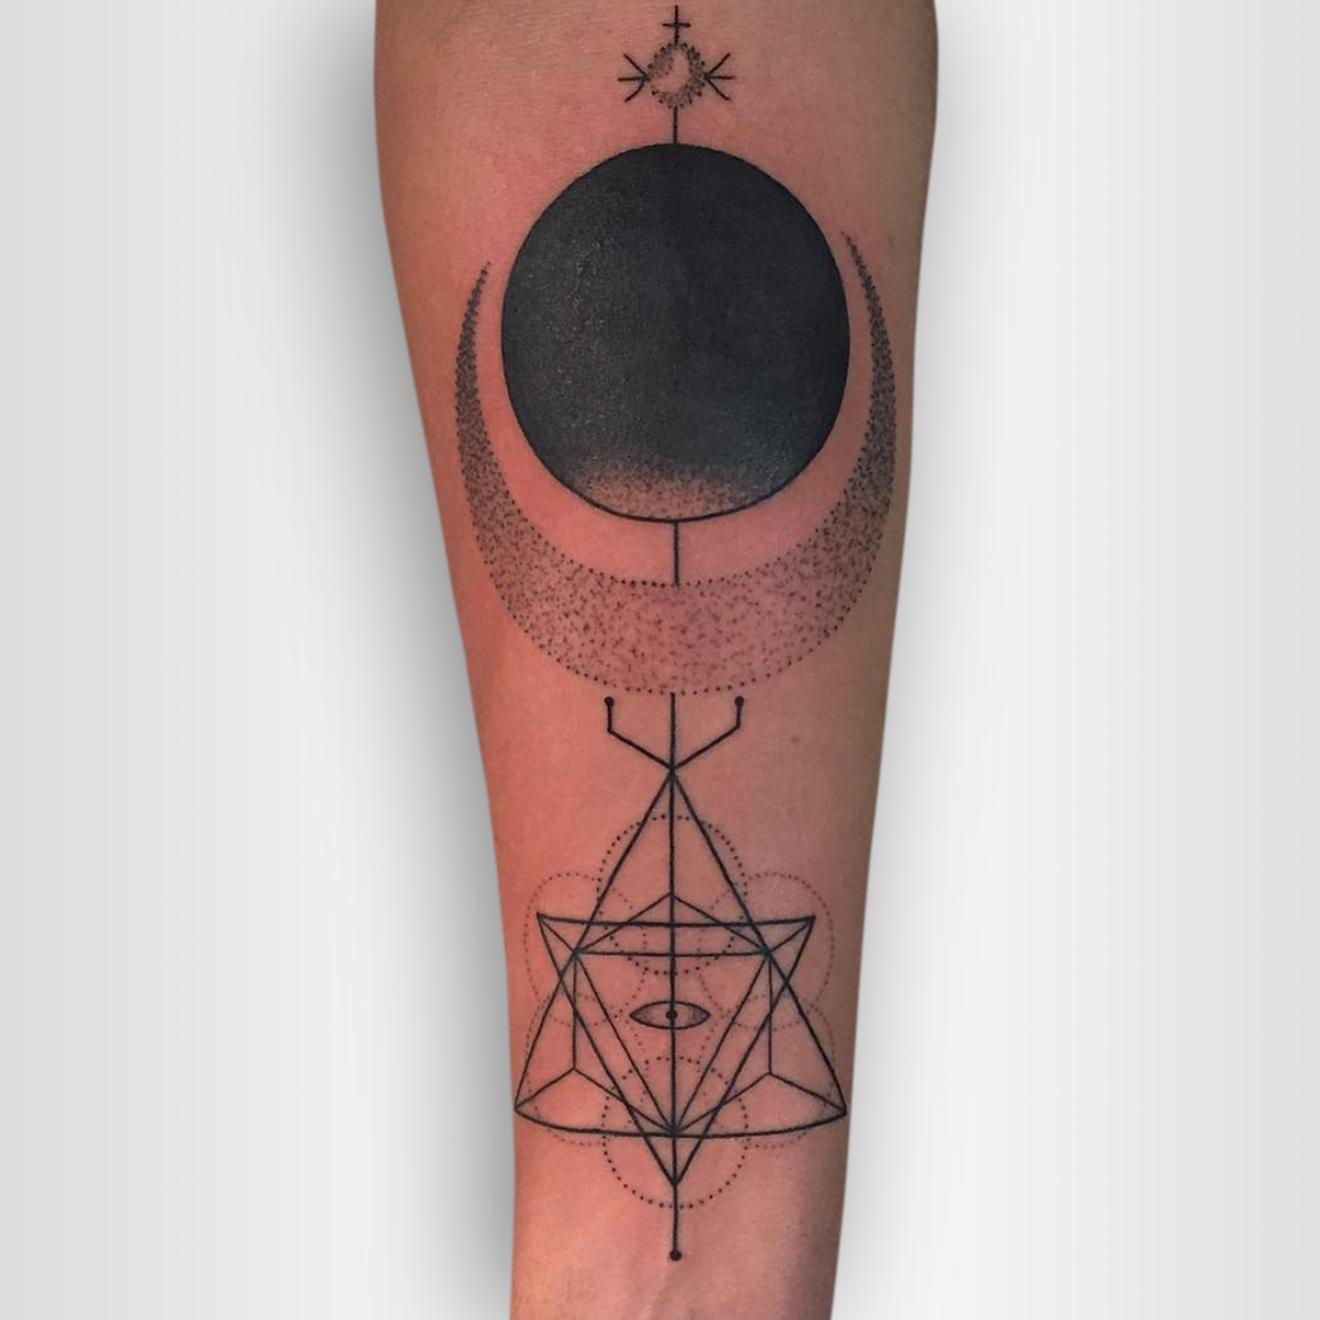 tattoo-artist-dustin-wengreen.jpg